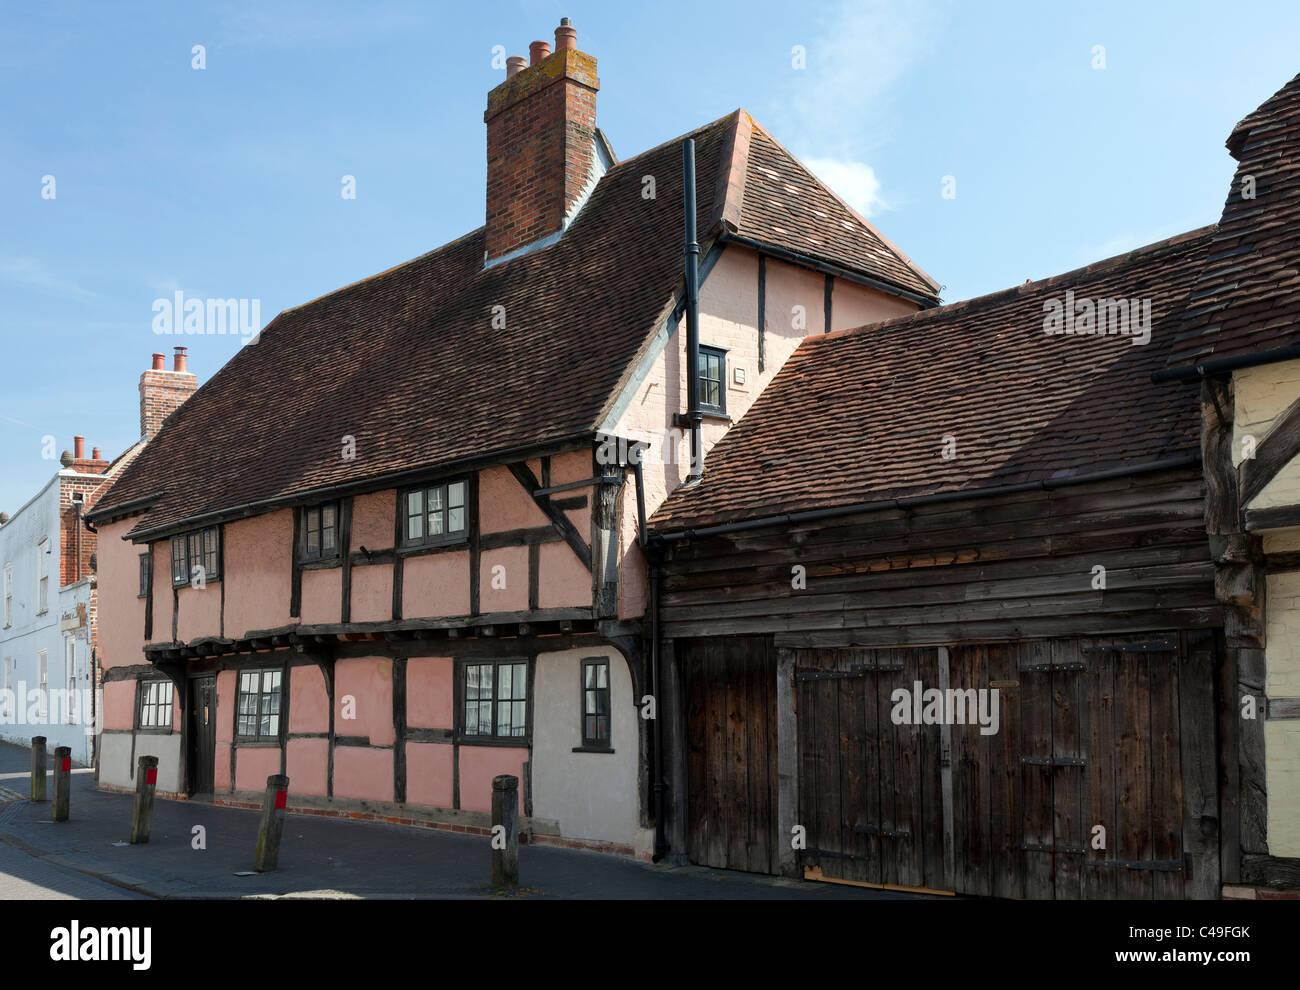 Old House dwelling Titchfield Hampshire England UK High Street timber frame wood wooden pink weathered oak garage - Stock Image